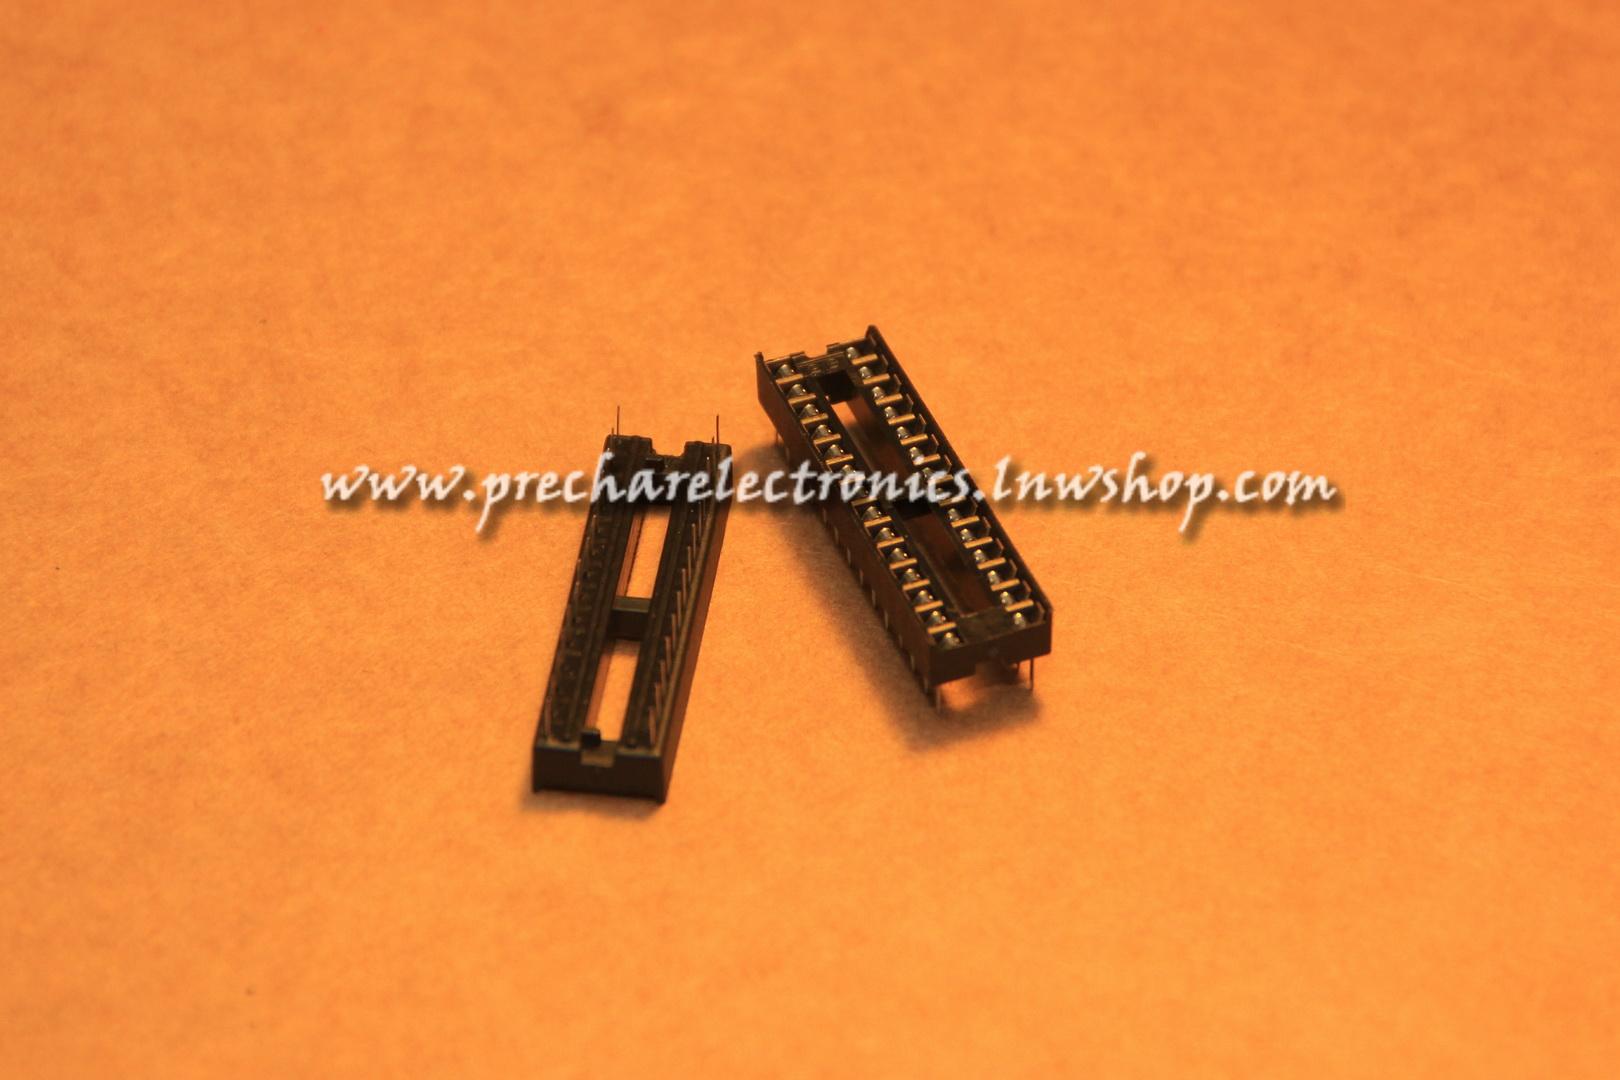 Socket IC 28 ขา (ขาแคบธรรมดา)